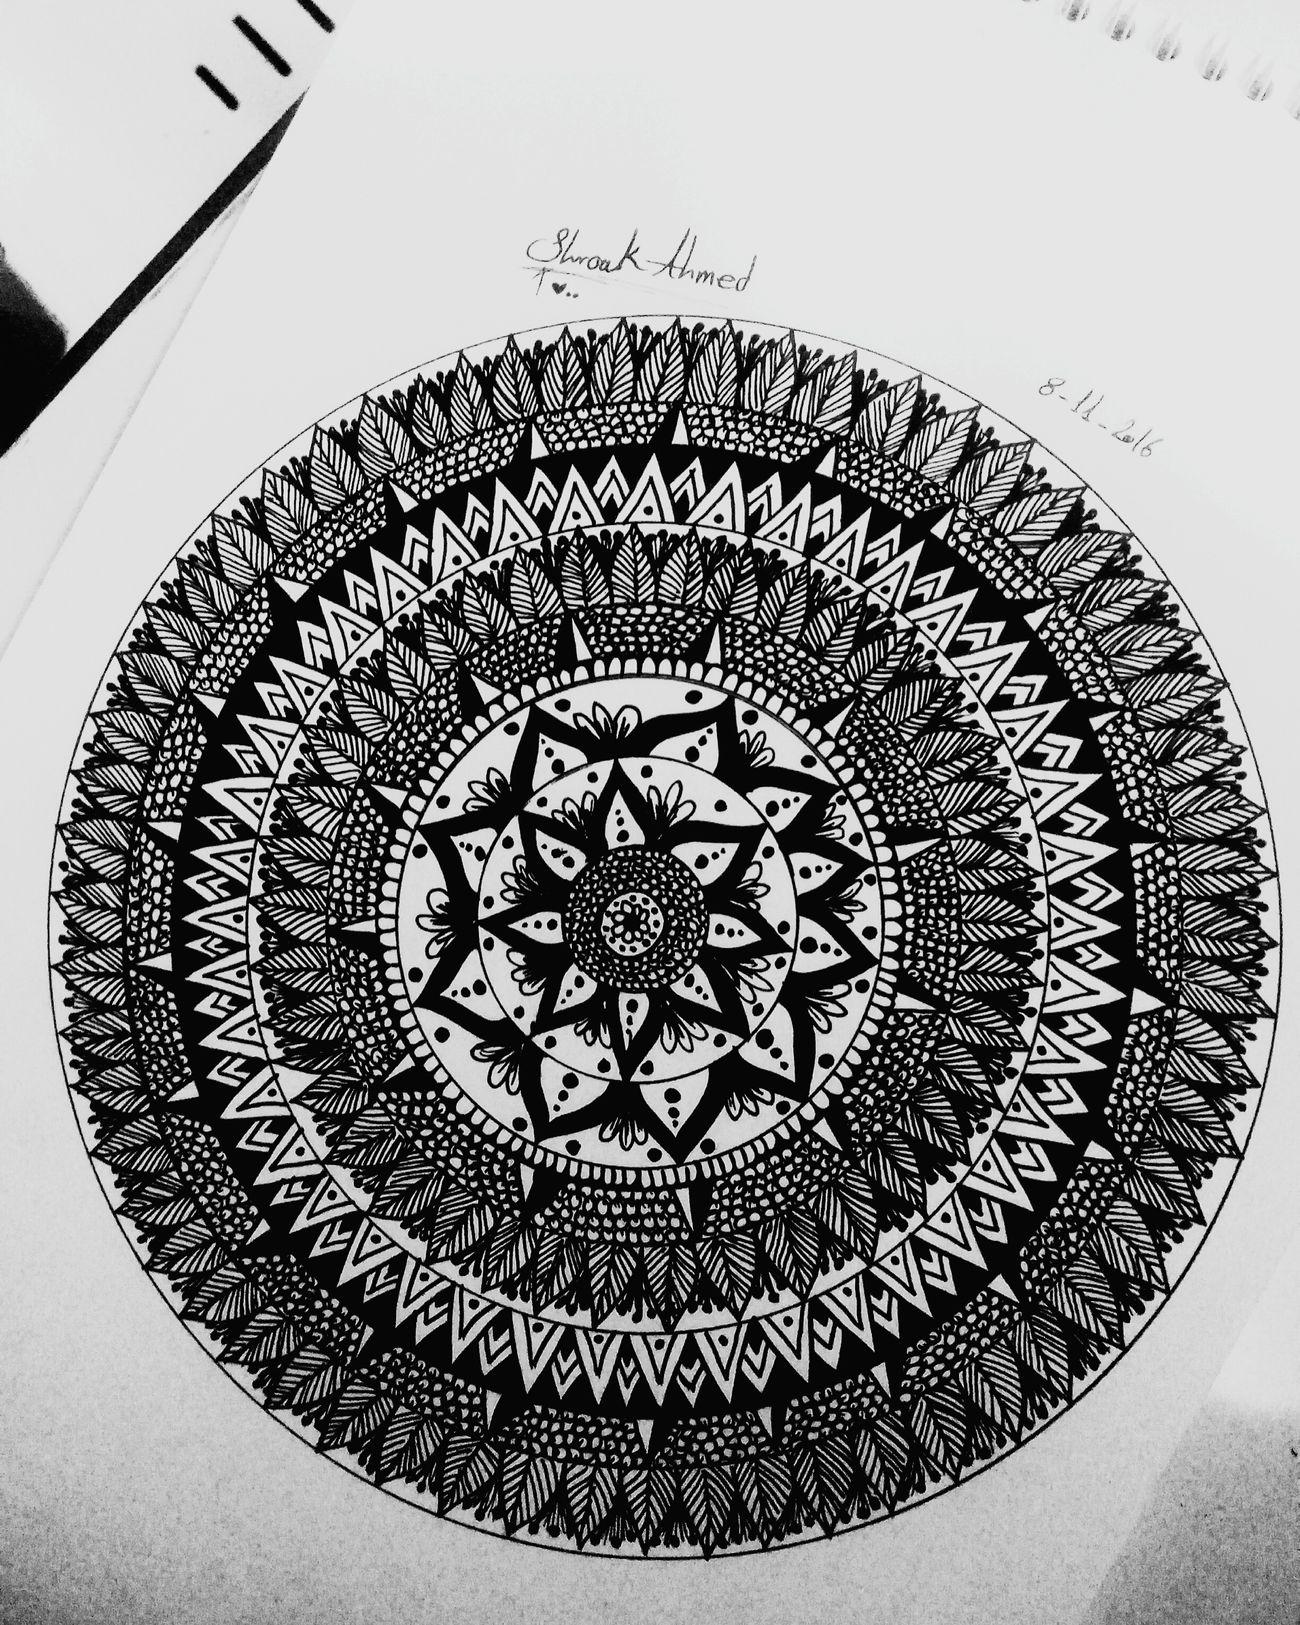 Makeup Mandalas Art Pattern Artphoto Galaxyart Astrology Galaxy Place Of Worship Astrology Sign Art Yourself Multi Colored Close-up Mandala Architecture Night Artistic Zentangle First Eyeem Photo Star - Space Space Indoors  No People Art, Drawing, Creativity ArtWork